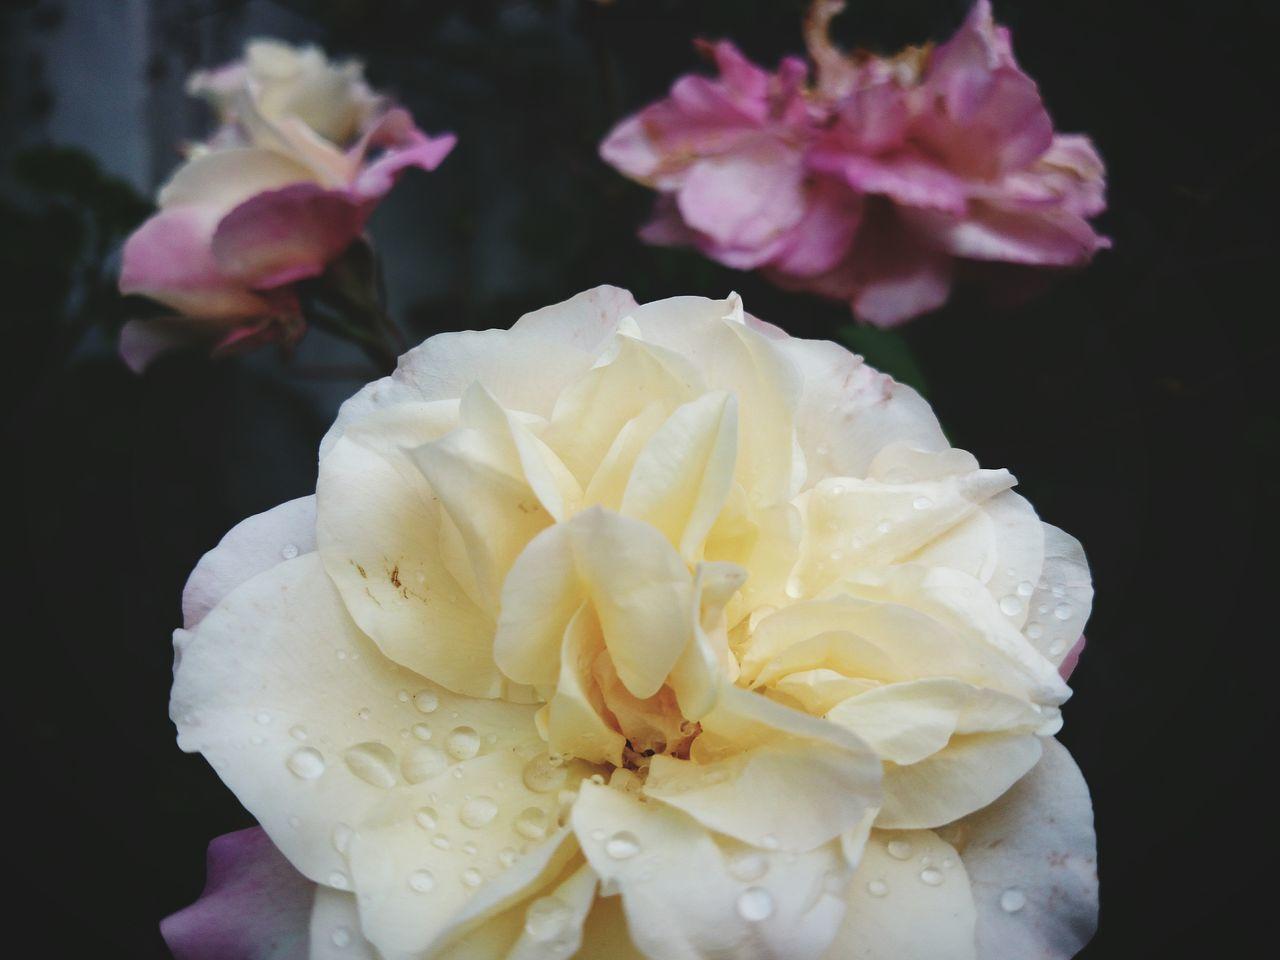 Flowers,Plants & Garden Rose🌹 Flowers Flower Flower Collection White Garden Garden Photography Photooftheday Followme Follow4follow Yellow Roses Blur